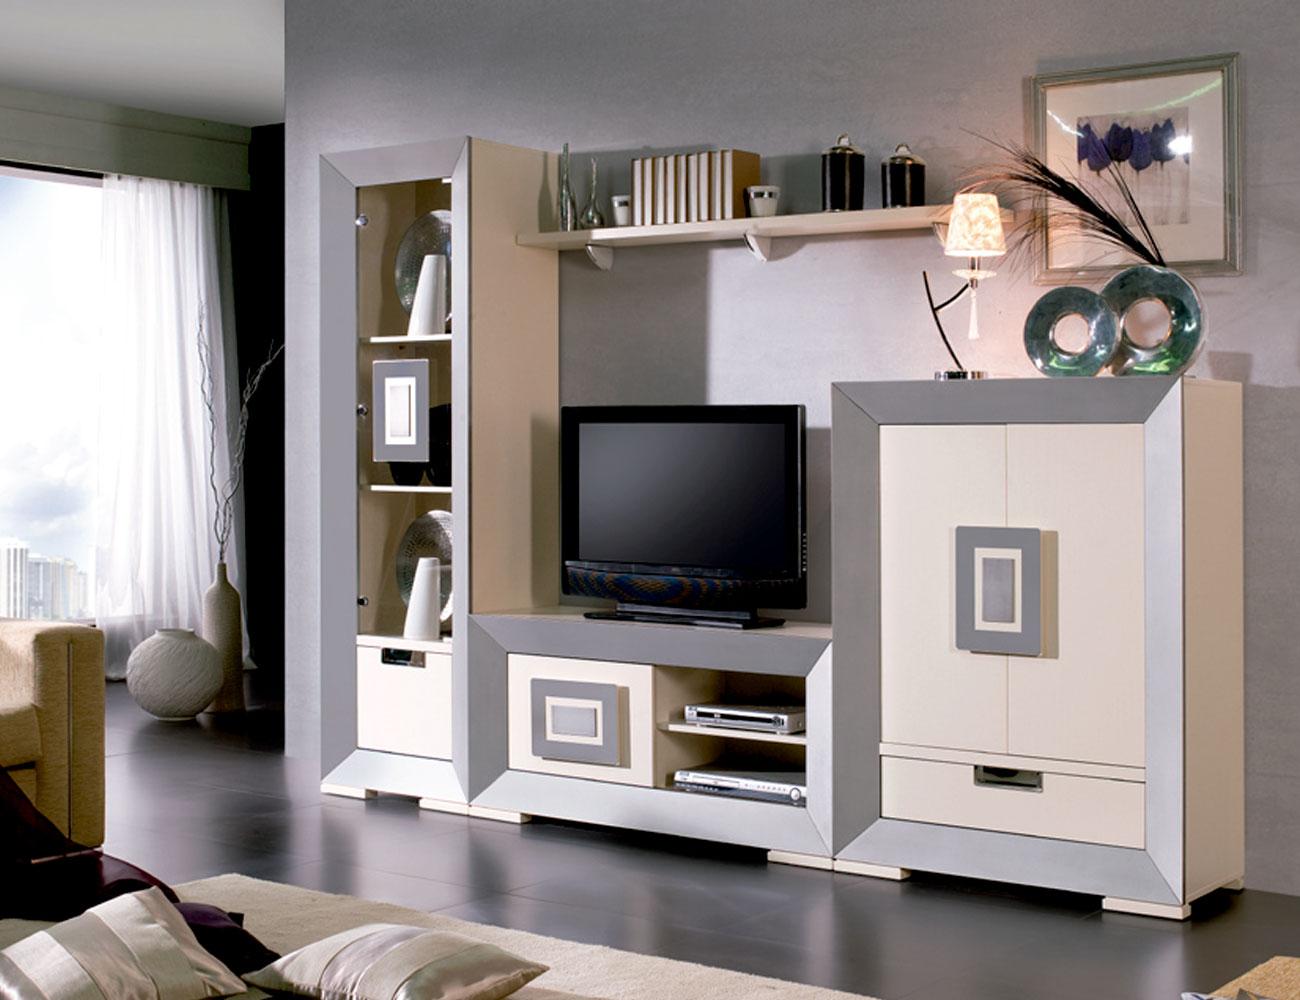 Mueble salon neoclasico color 504 503 tirador acero2